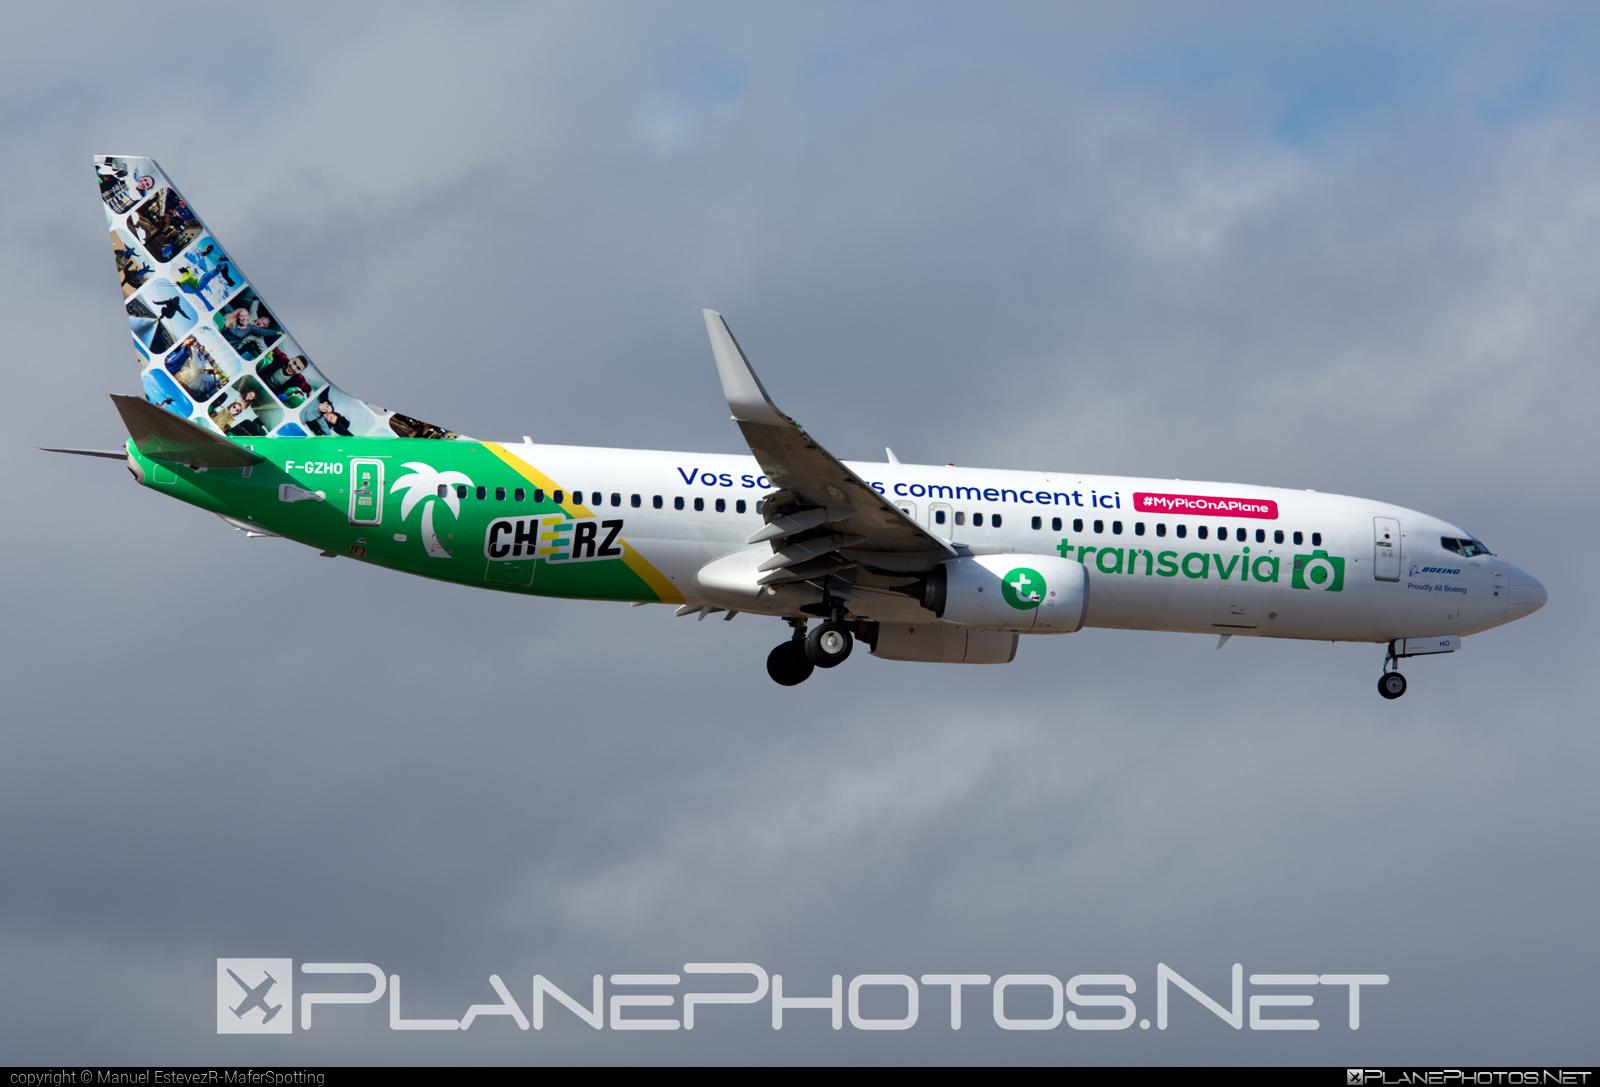 Boeing 737-800 - F-GZHO operated by Transavia France #b737 #b737nextgen #b737ng #boeing #boeing737